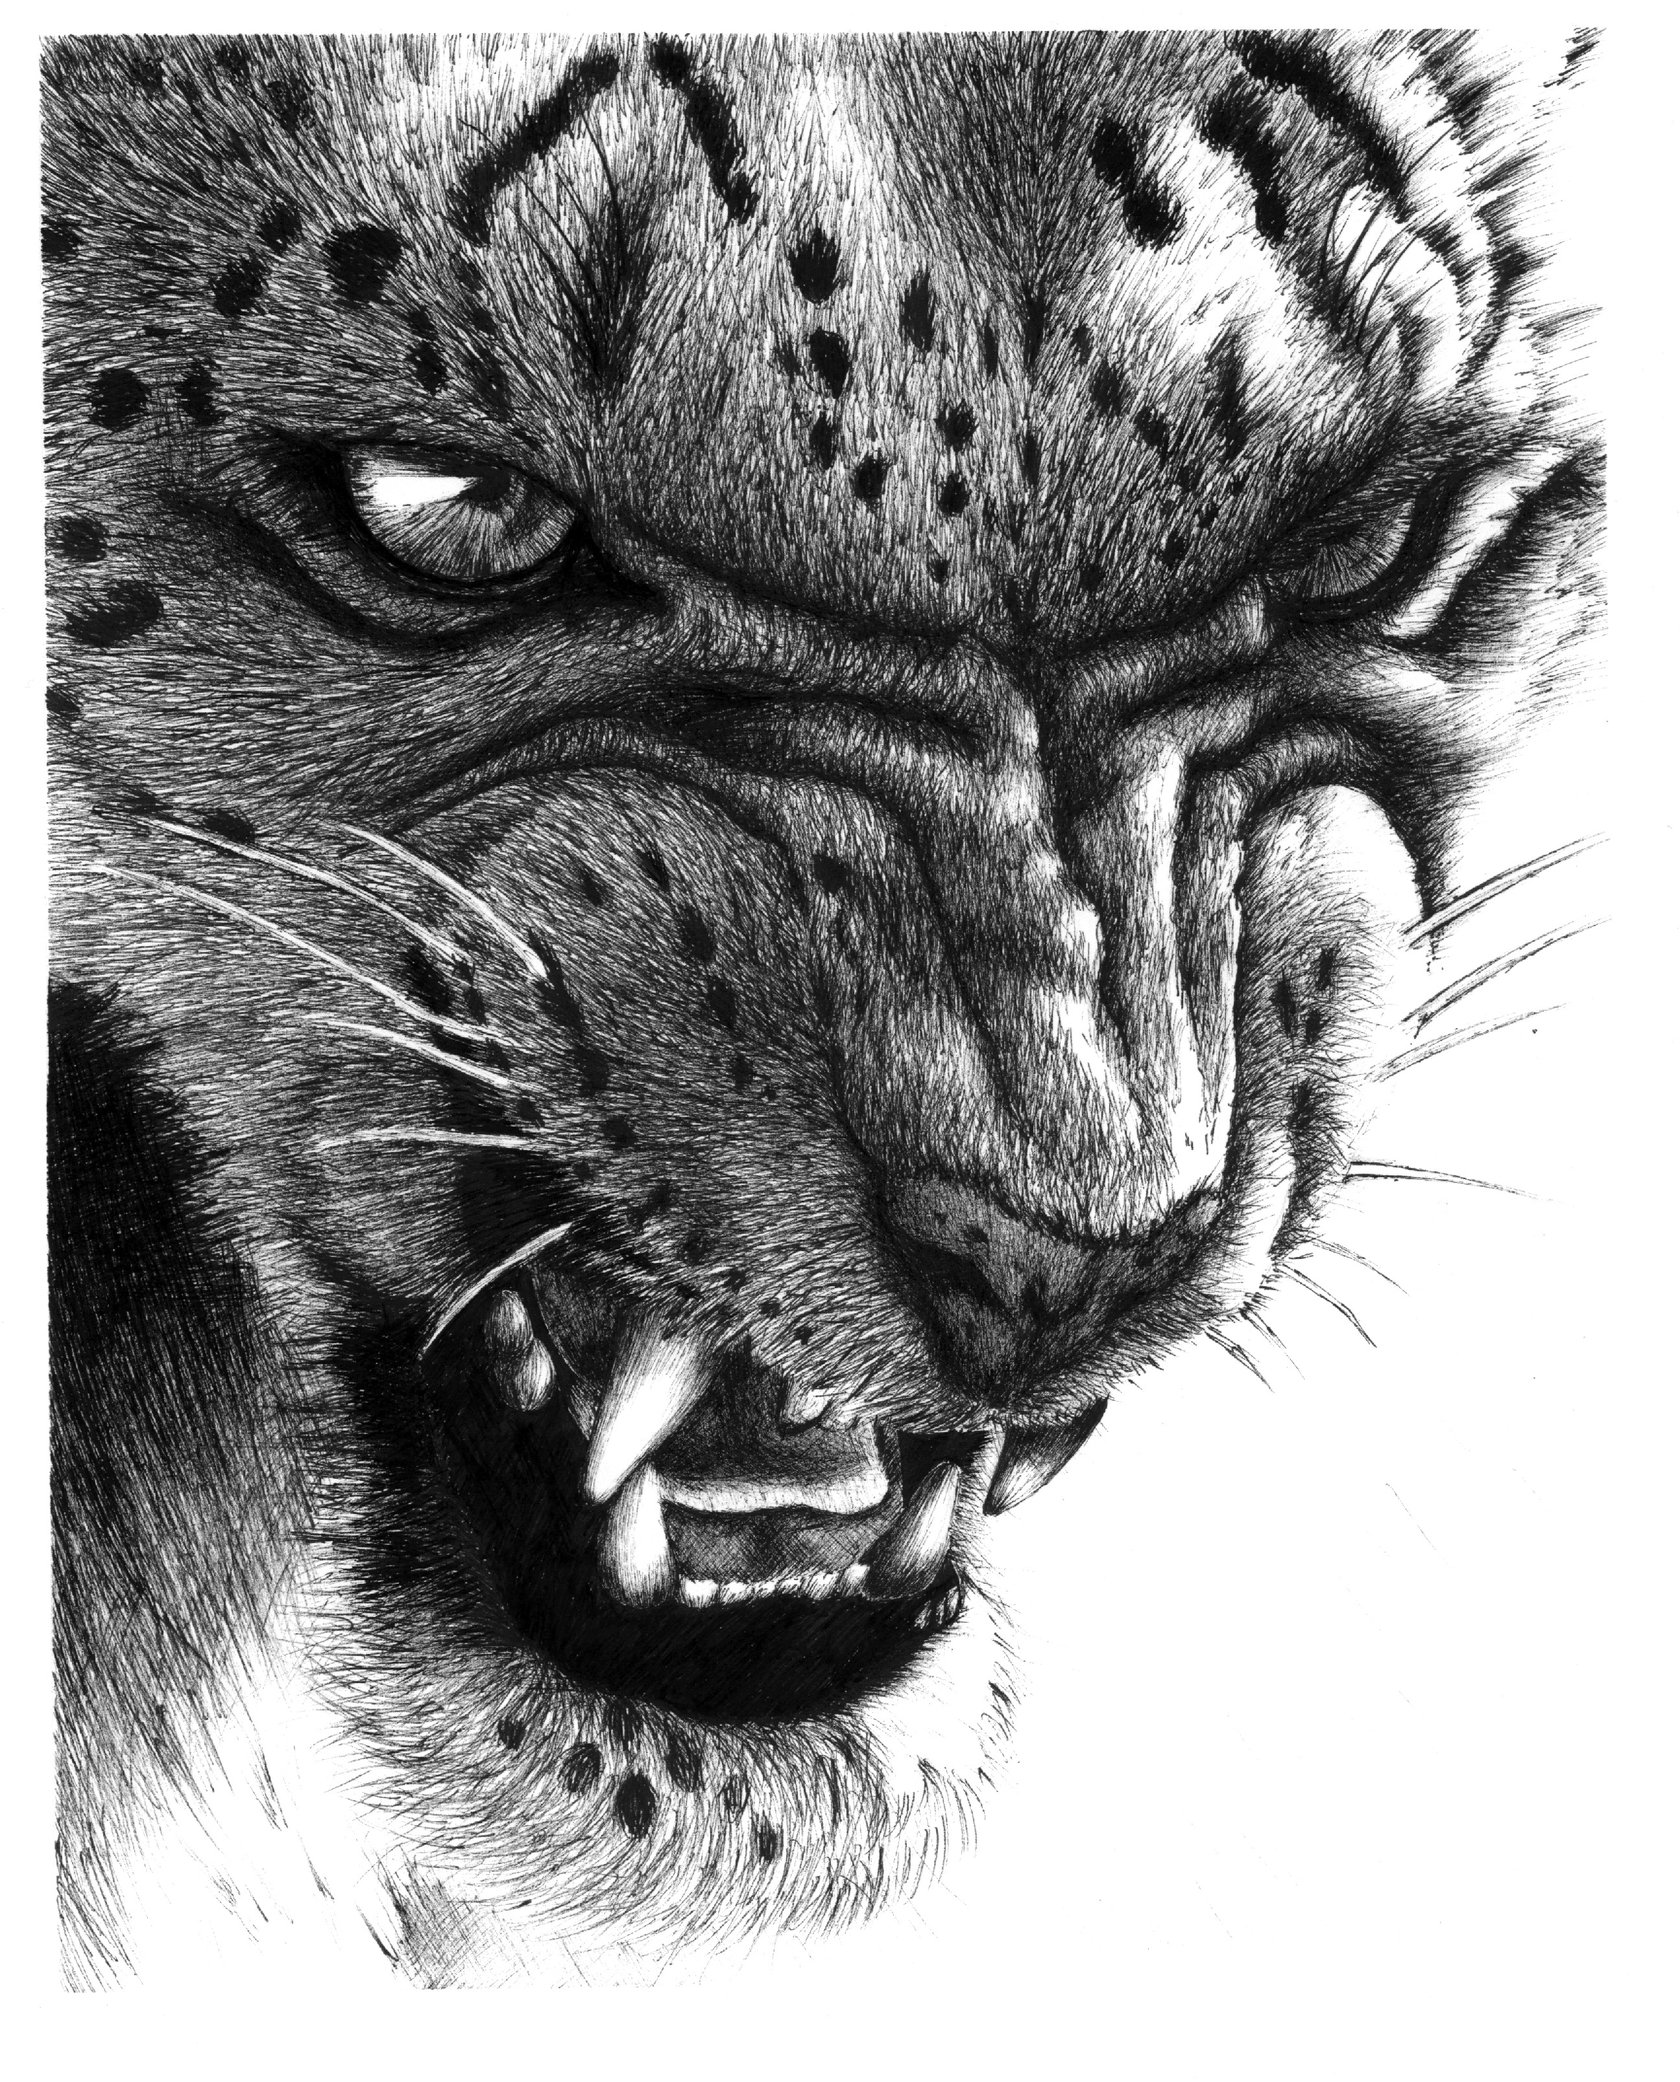 Drawn snow leopard deviantart Conchenn by Snow Leopard by